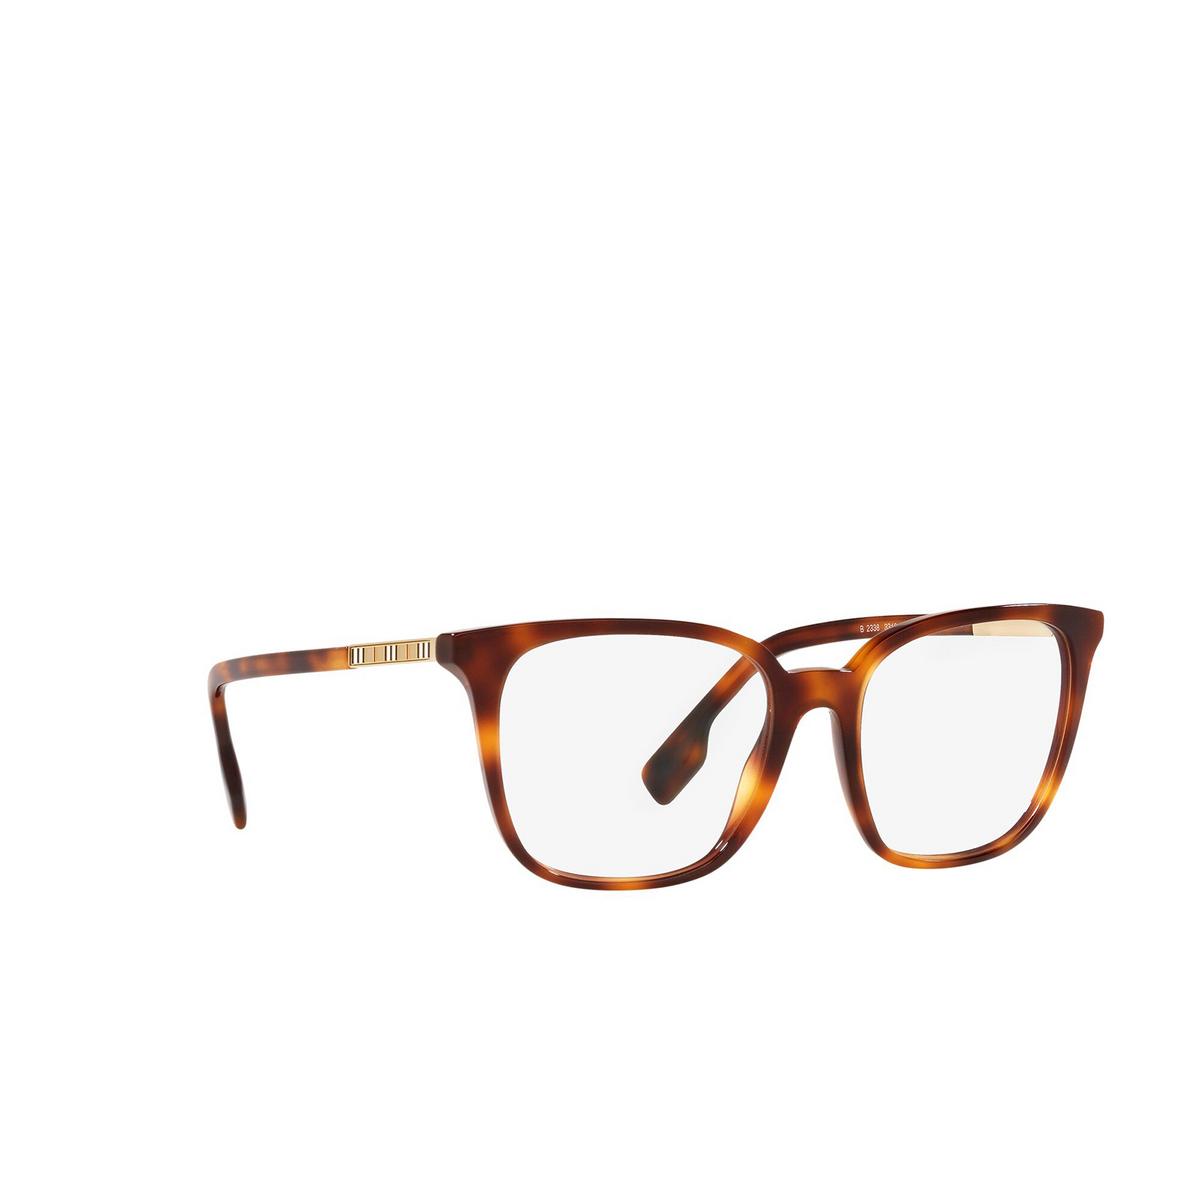 Burberry® Square Eyeglasses: Leah BE2338 color Light Havana 3316 - three-quarters view.